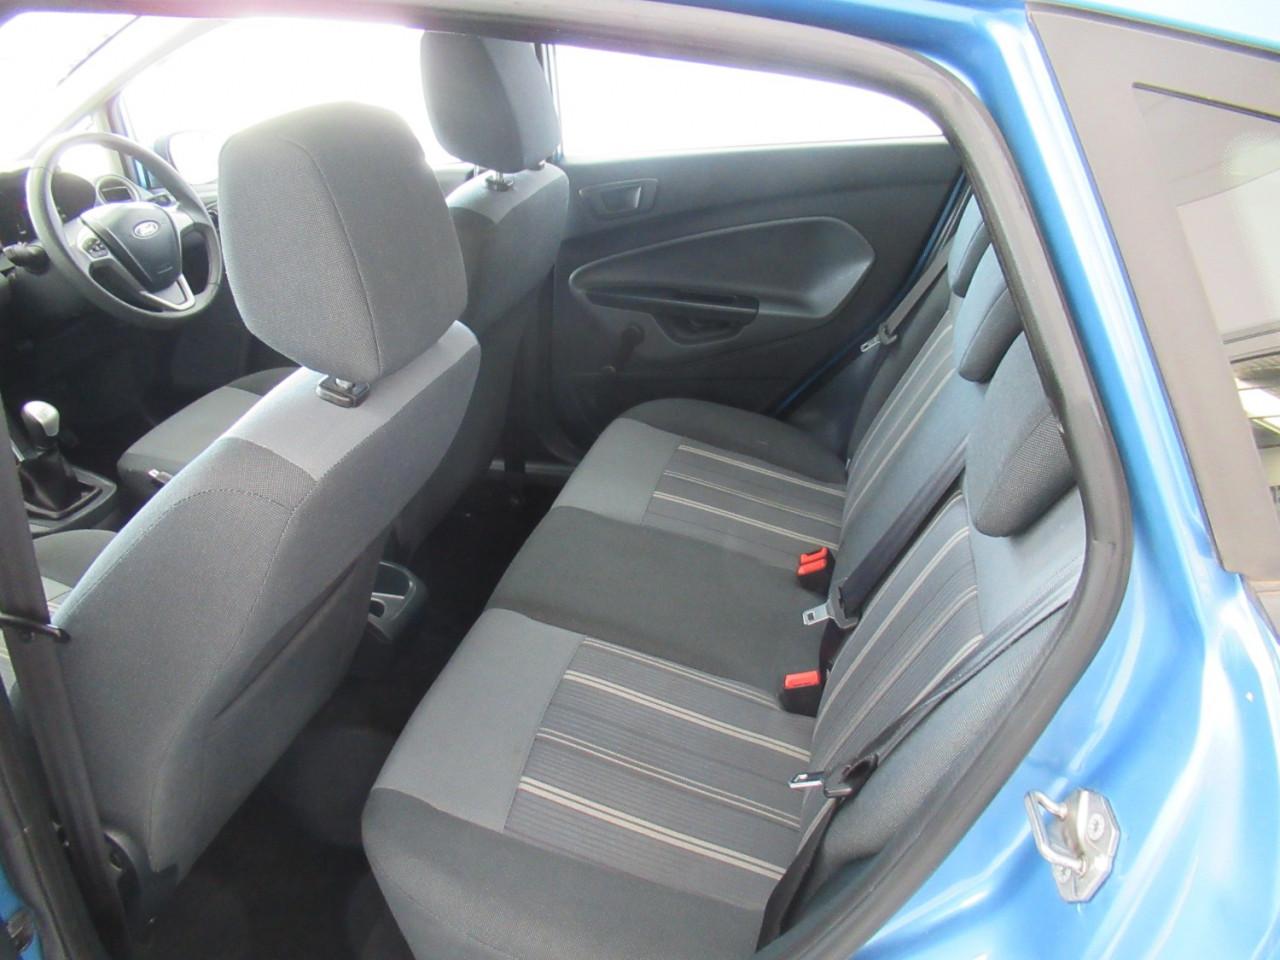 2009 Ford Fiesta WS CL Hatchback Image 22